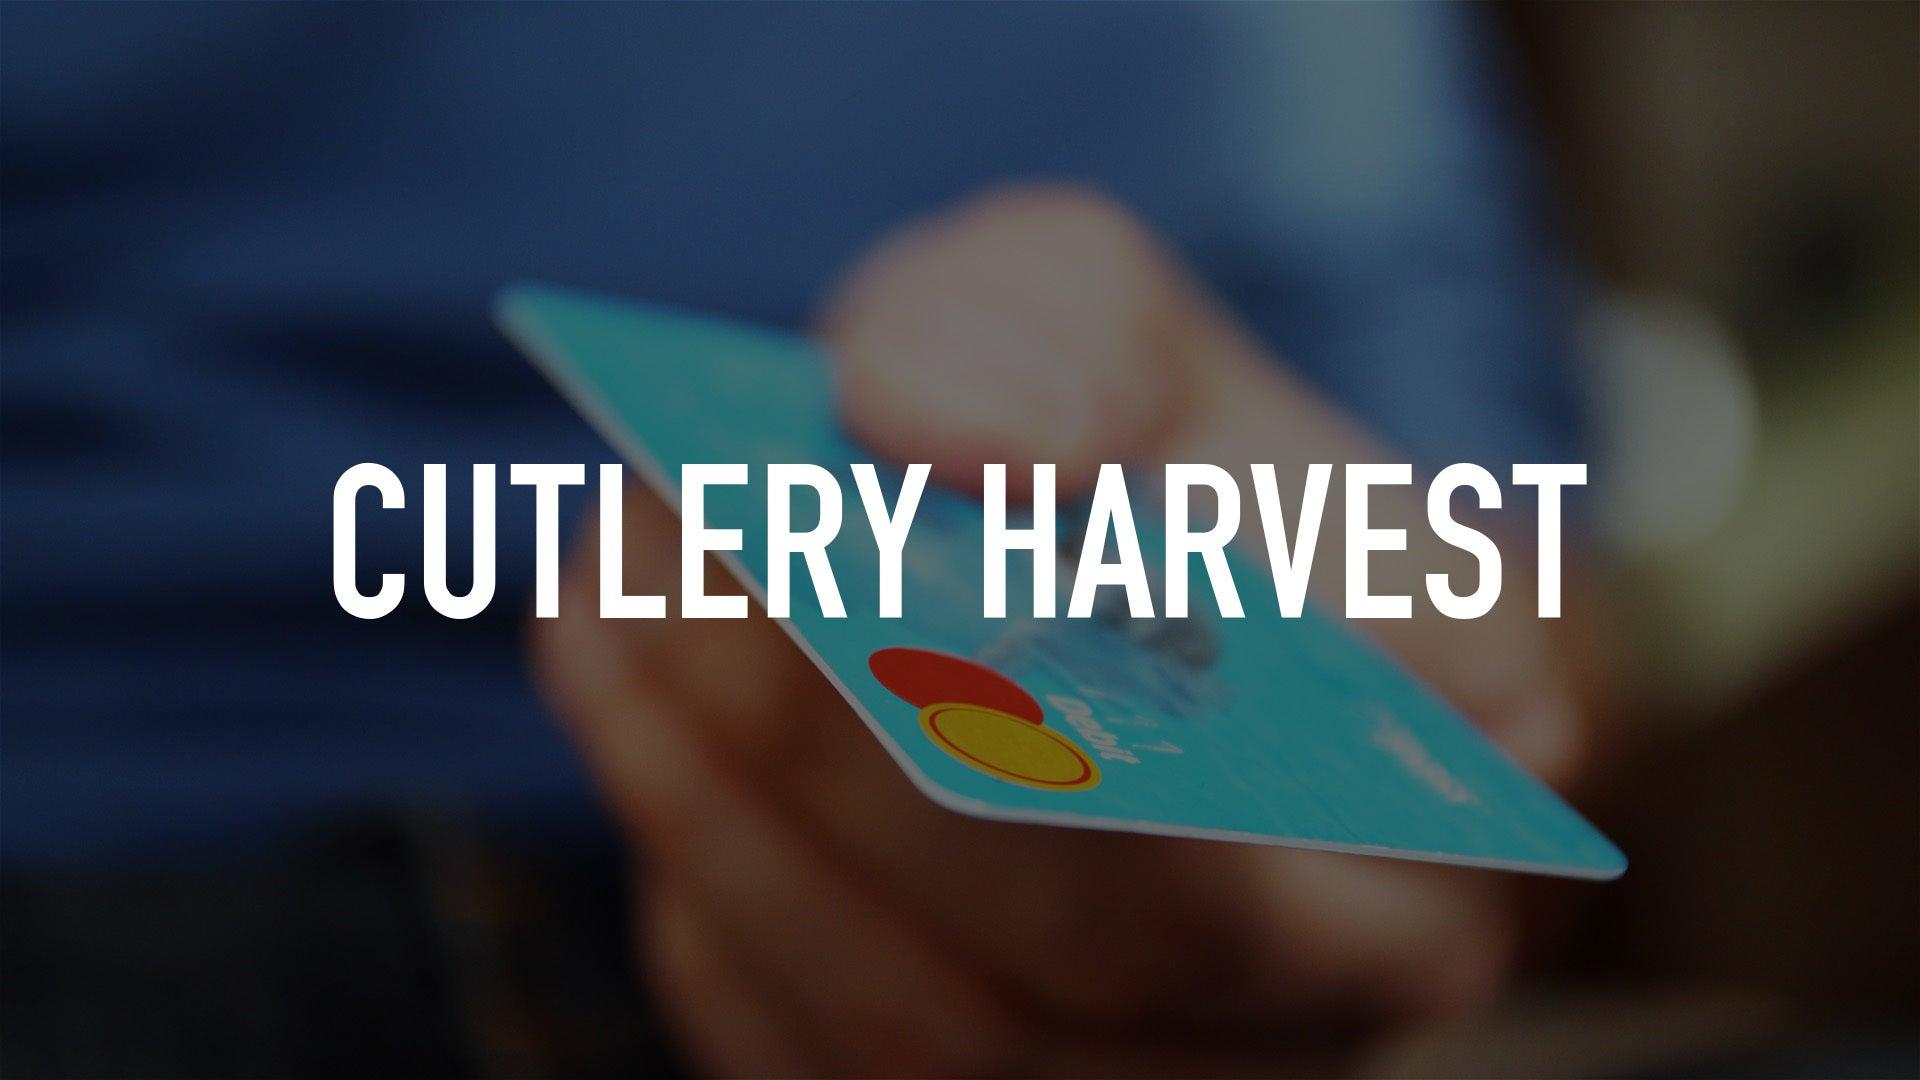 Cutlery Harvest